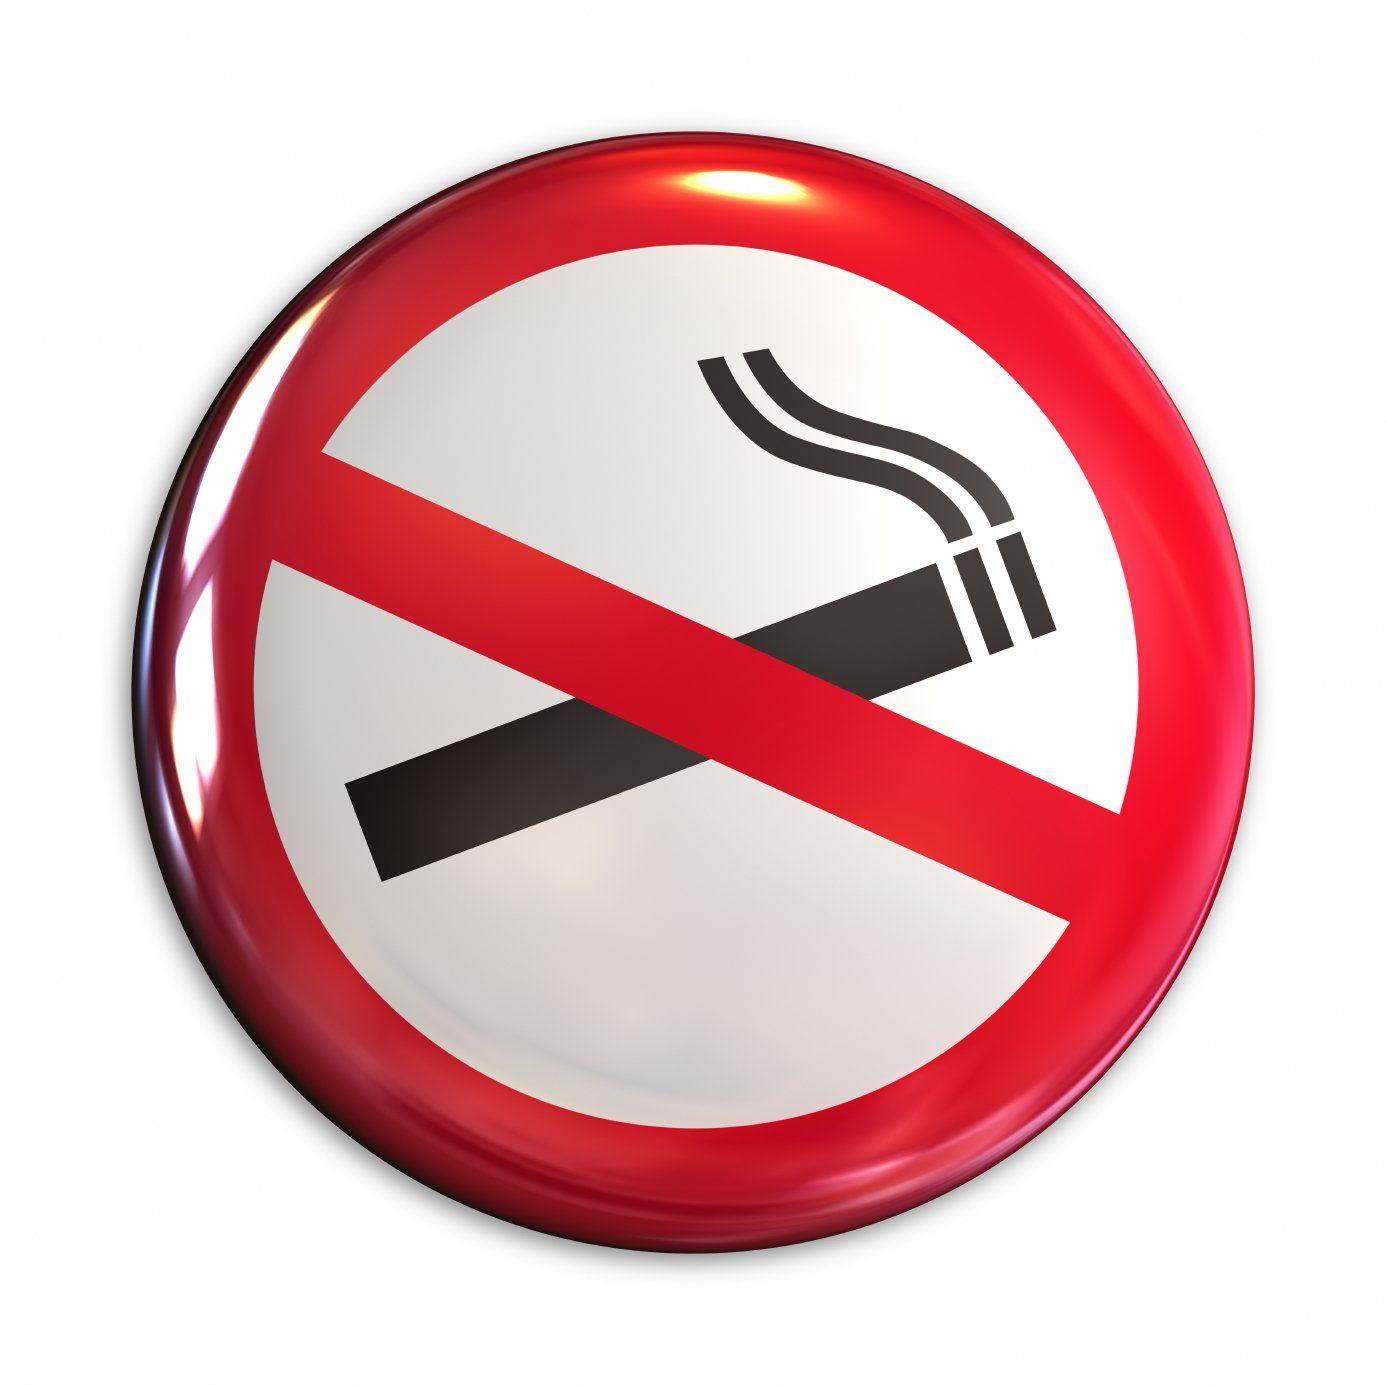 Rauchen aufhorem agressiv